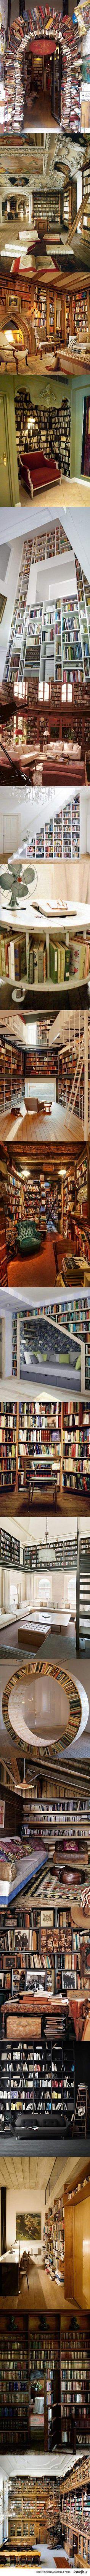 Oh YES PLEASE! BOOKS BOOKS BOOKS BOOKS!